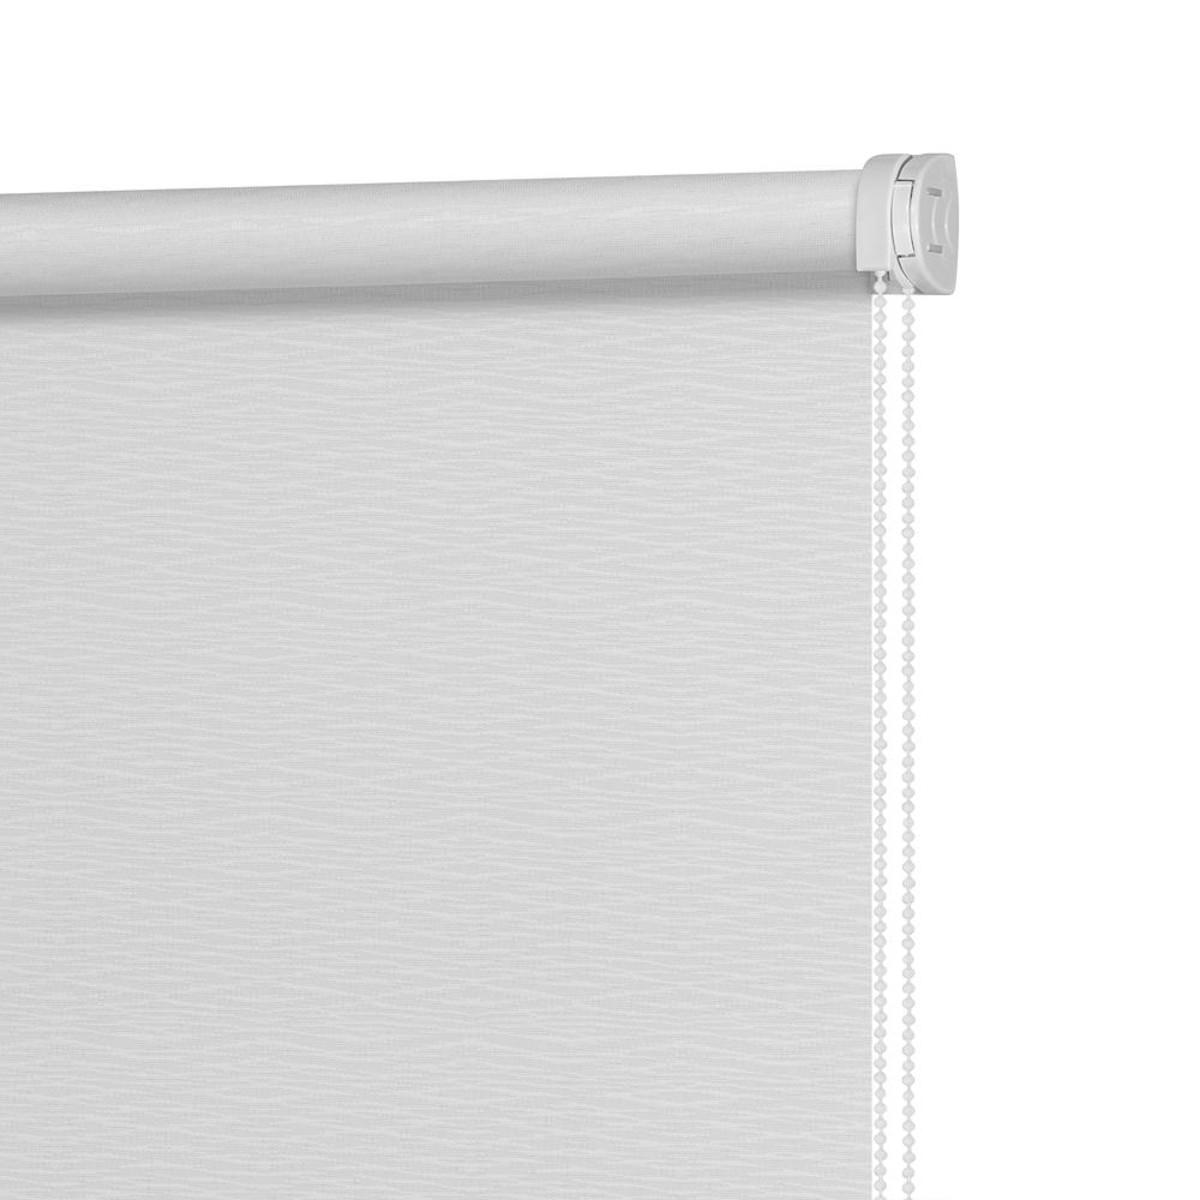 Рулонная Ора Decofest Маринела 100Х160 Цвет Серый